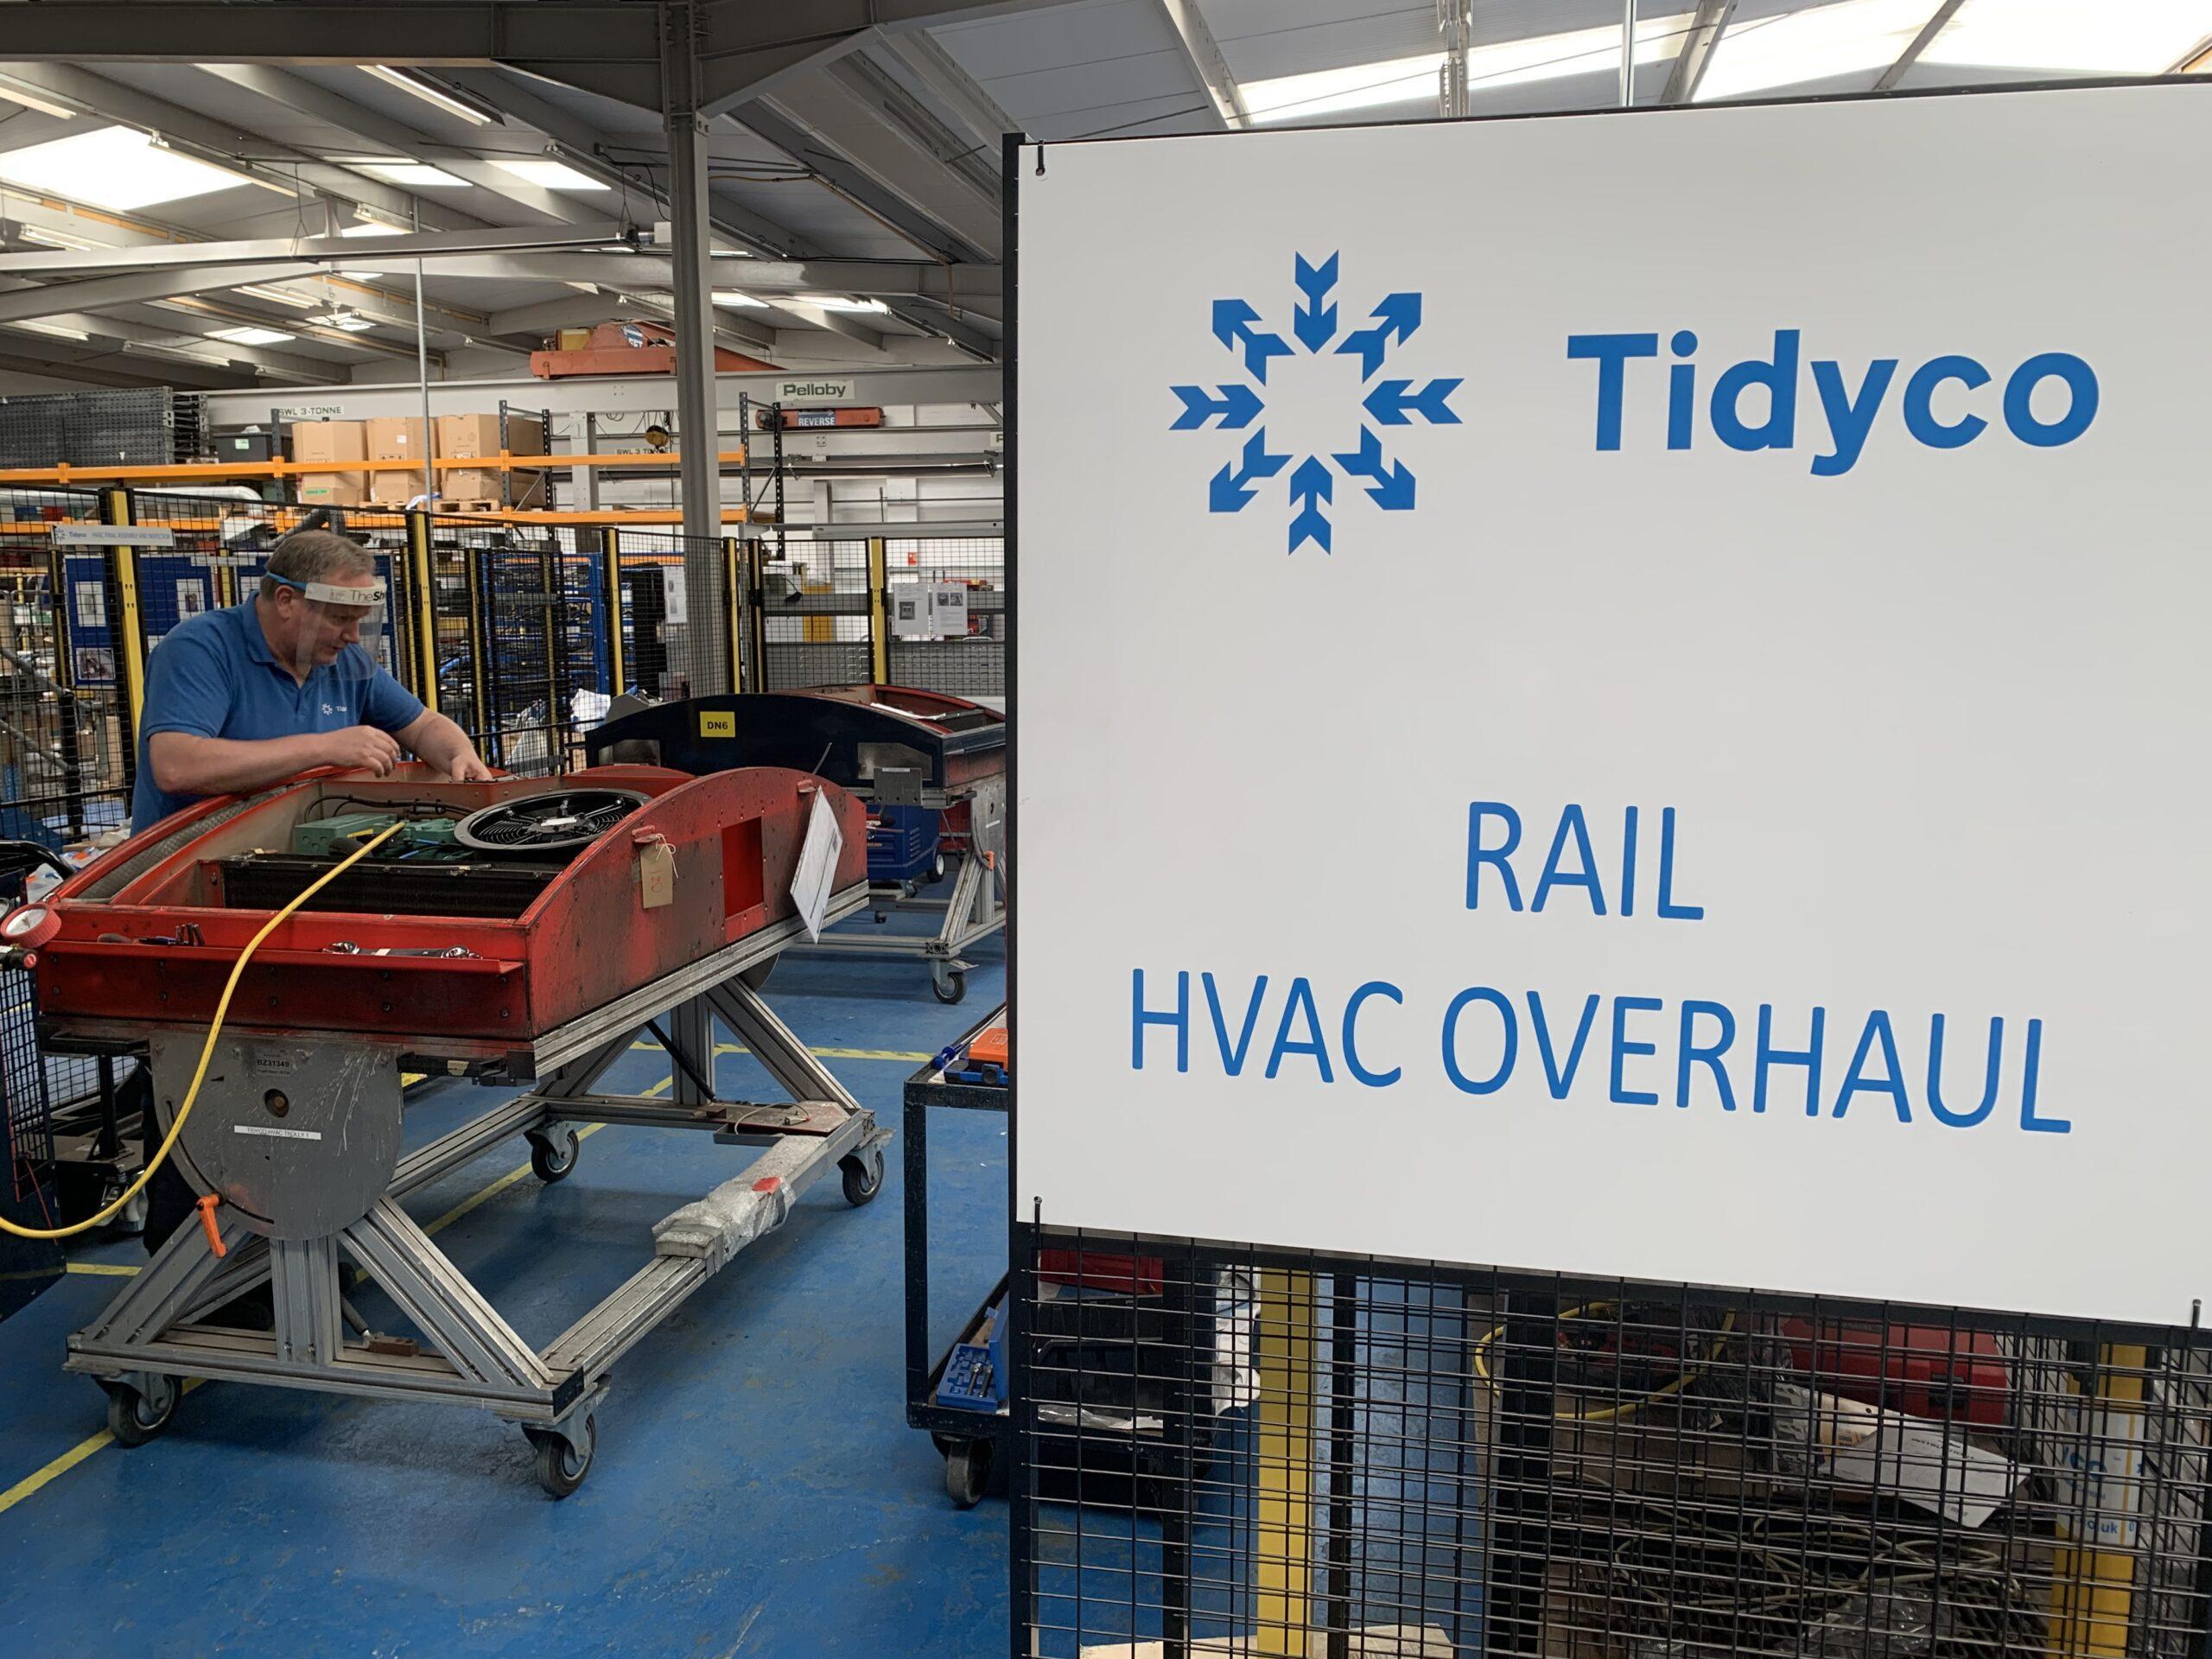 tidyco rail HVAC overhaul